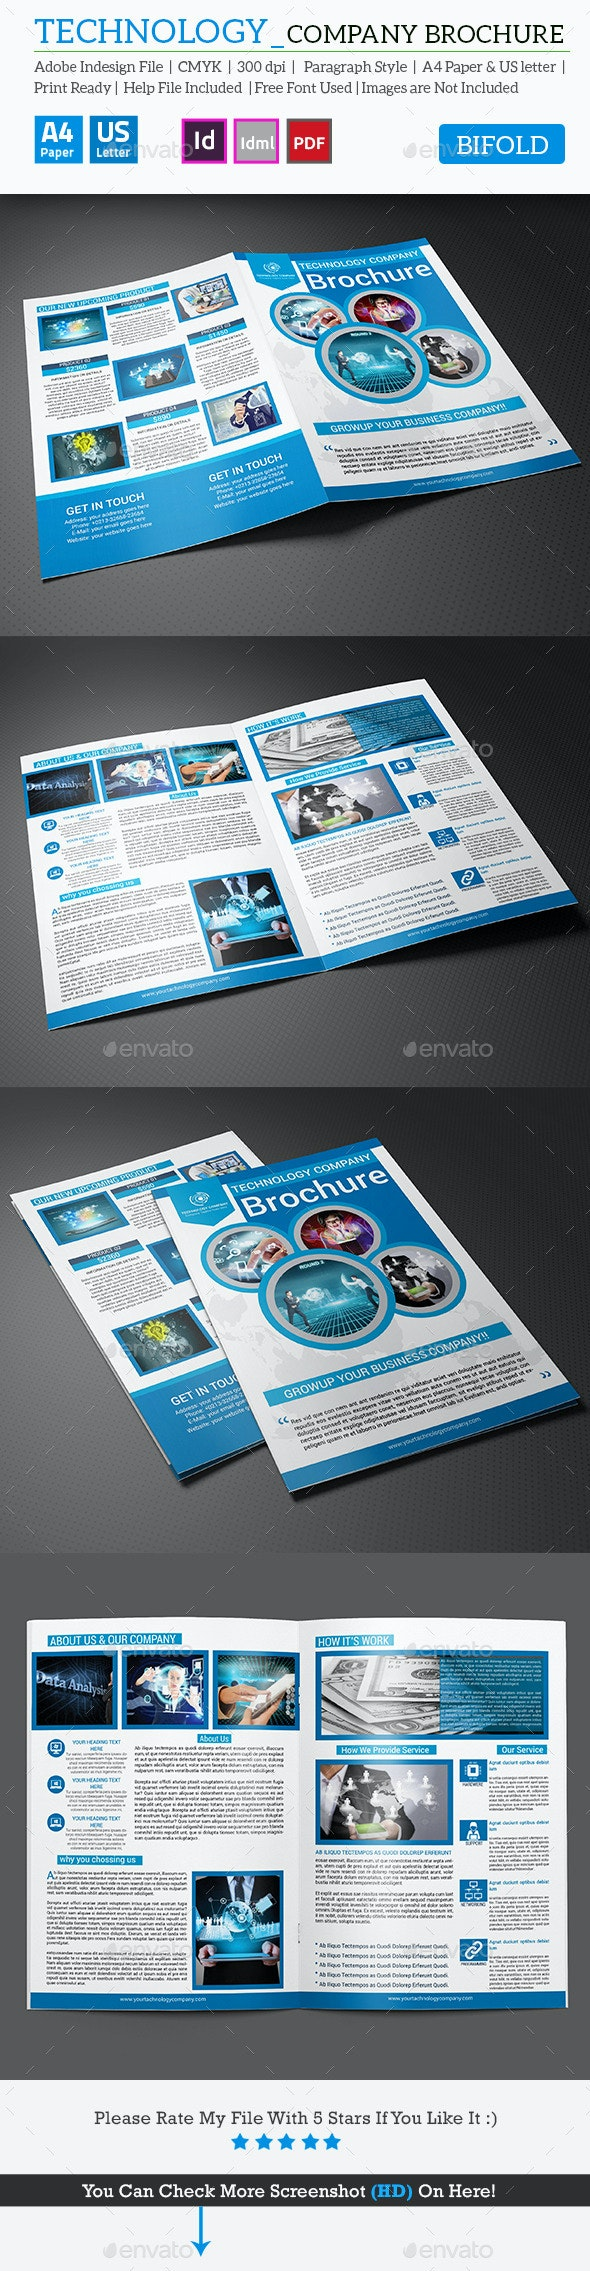 Technology Company Bifold Brochure - Corporate Brochures